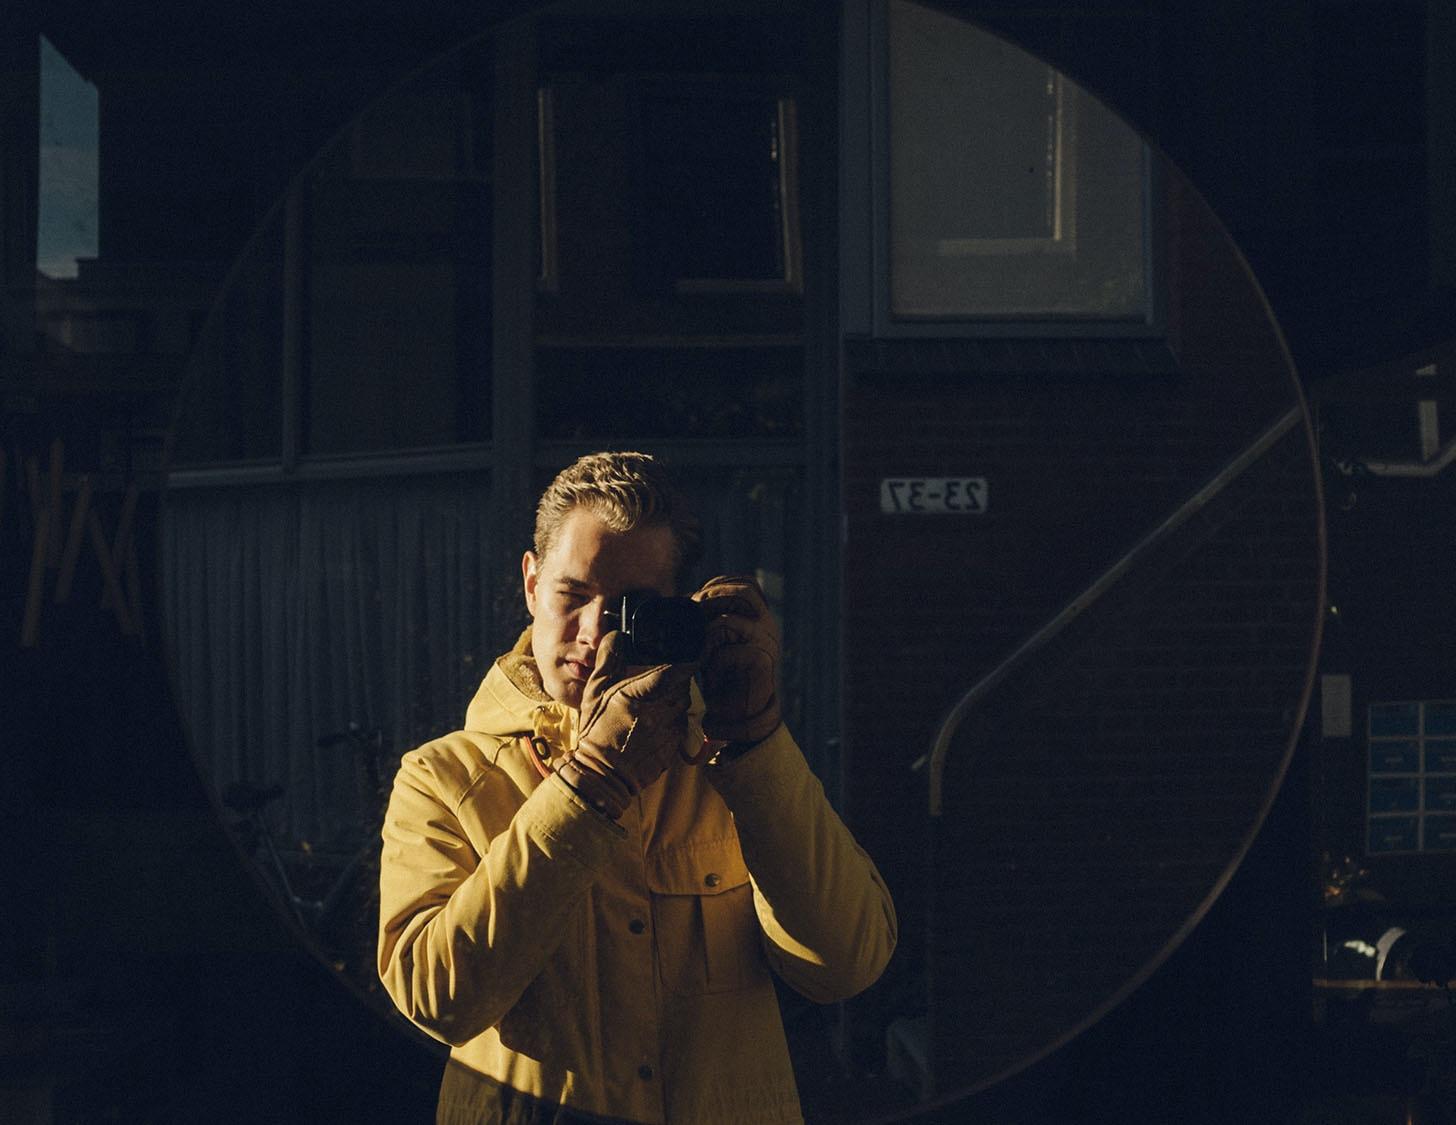 Go to Vincent Versluis's profile